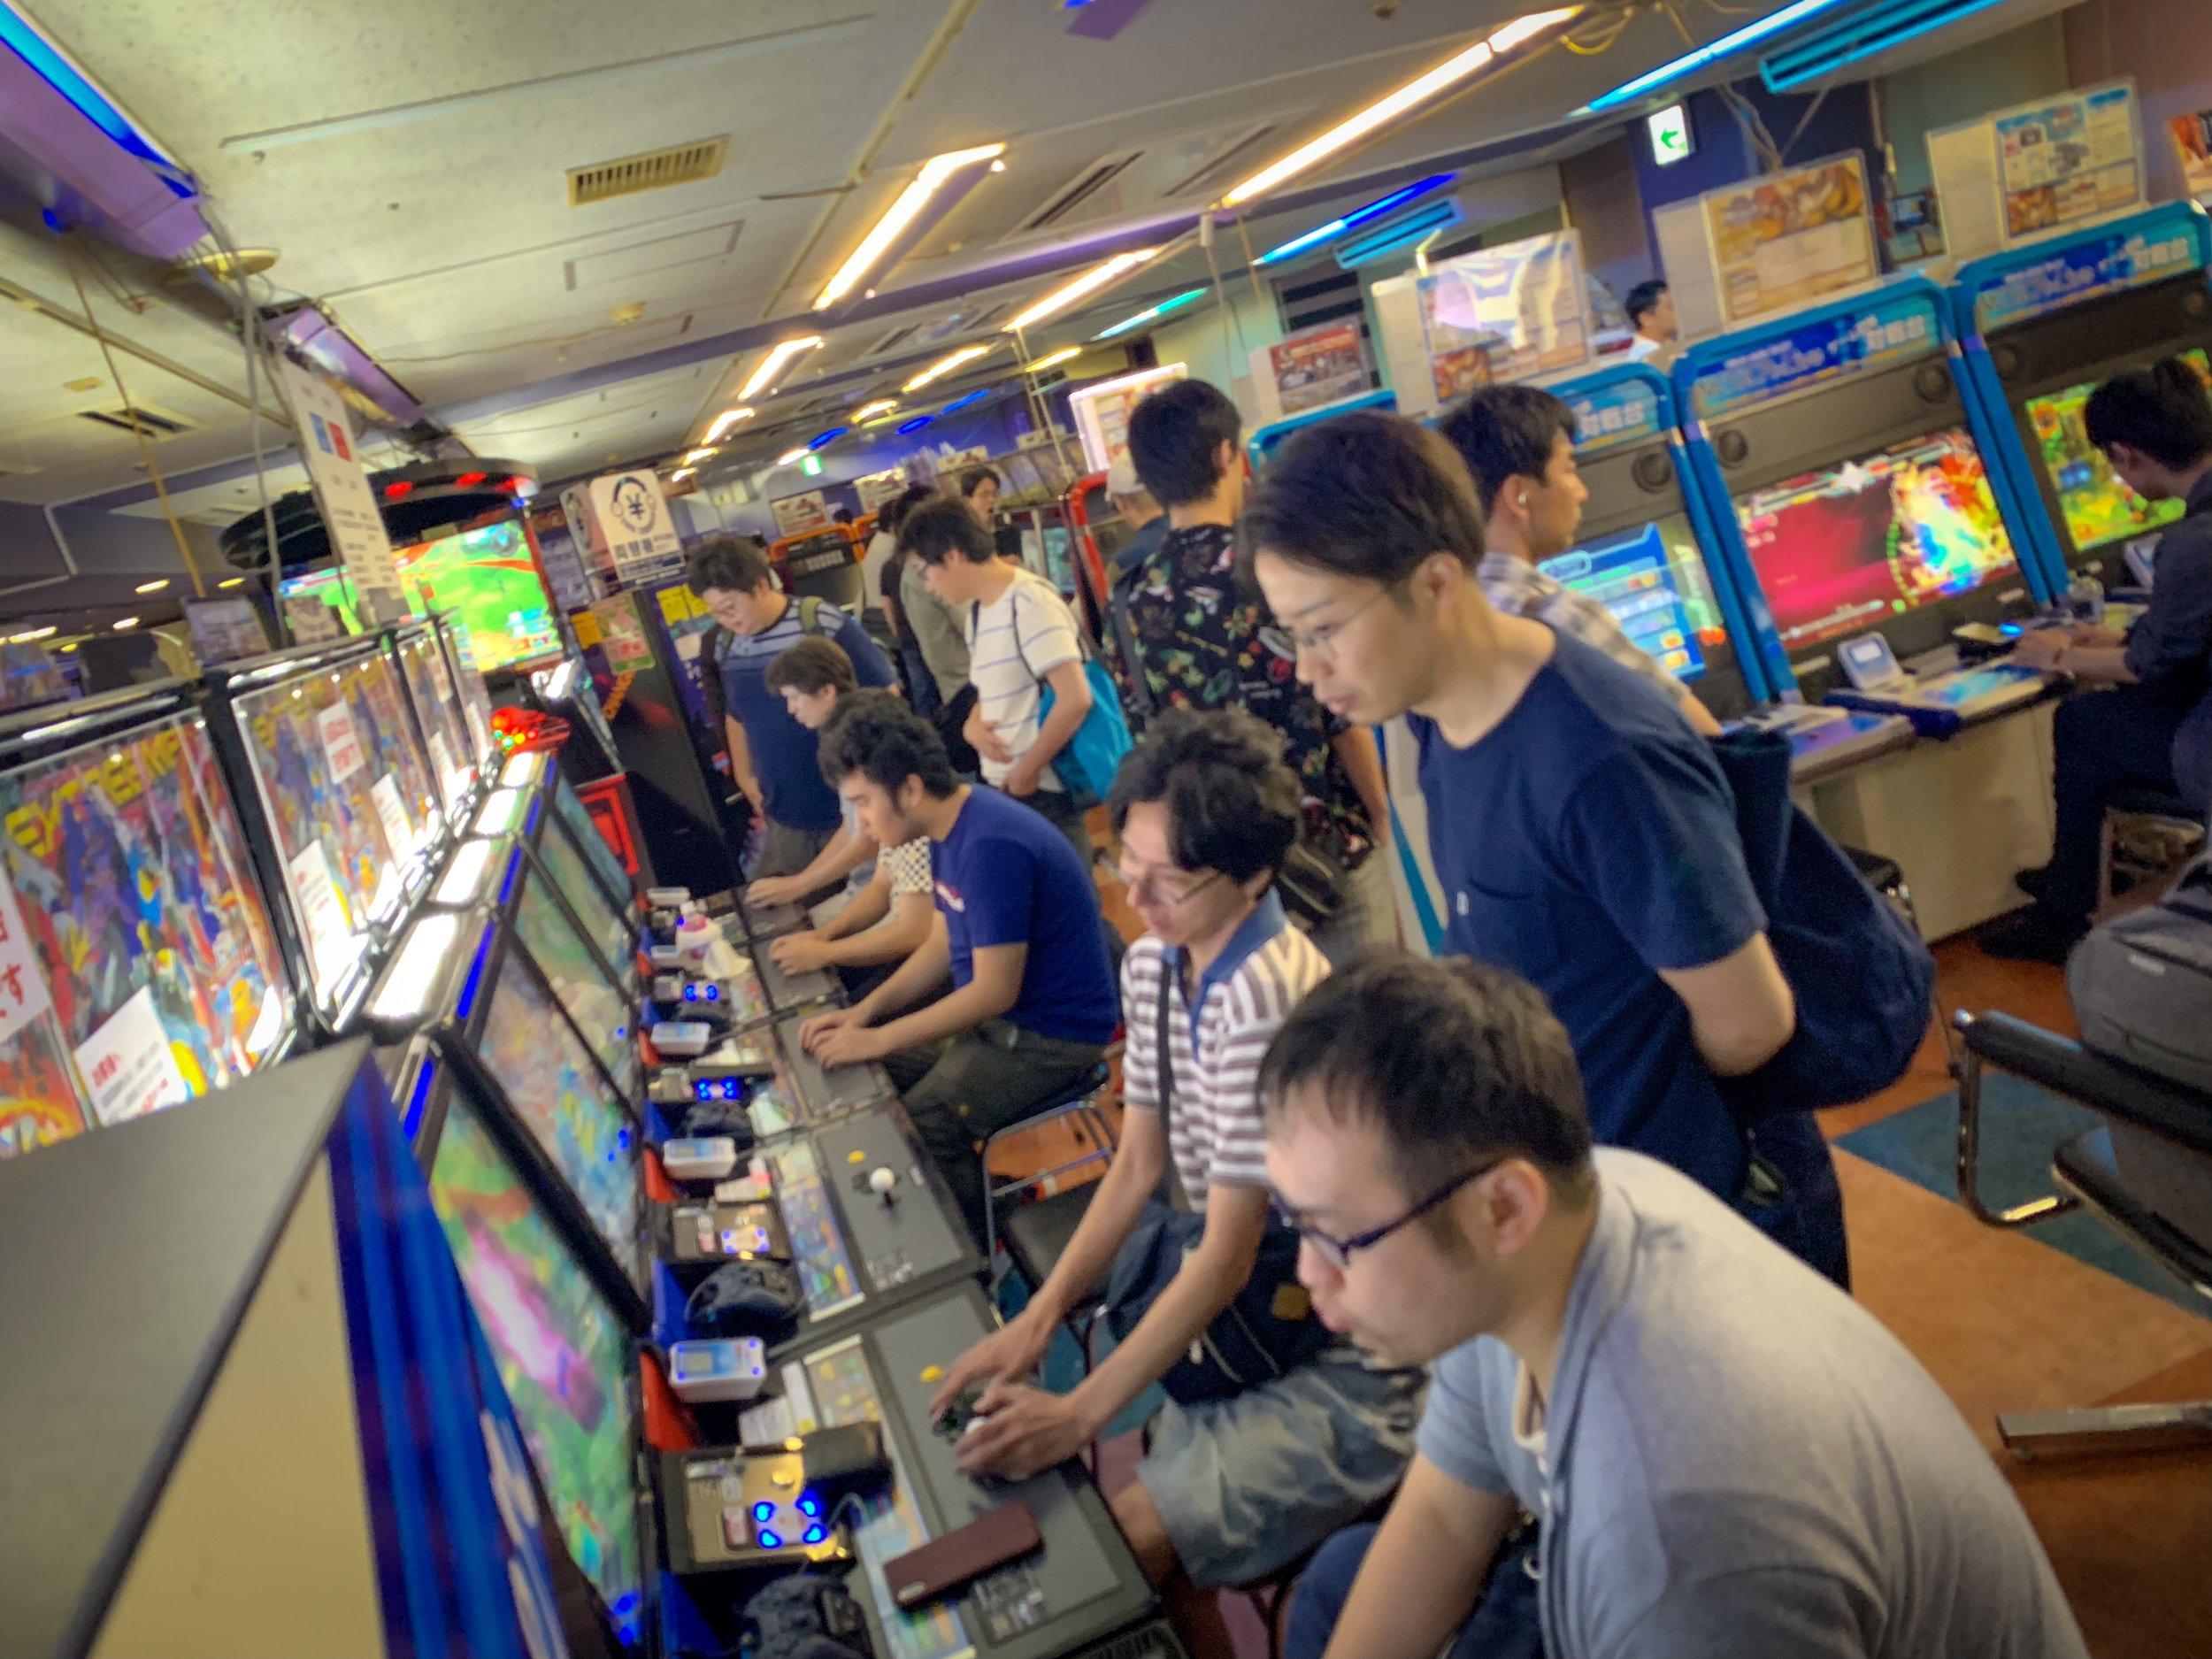 Locals hit the arcades in Akihabara.